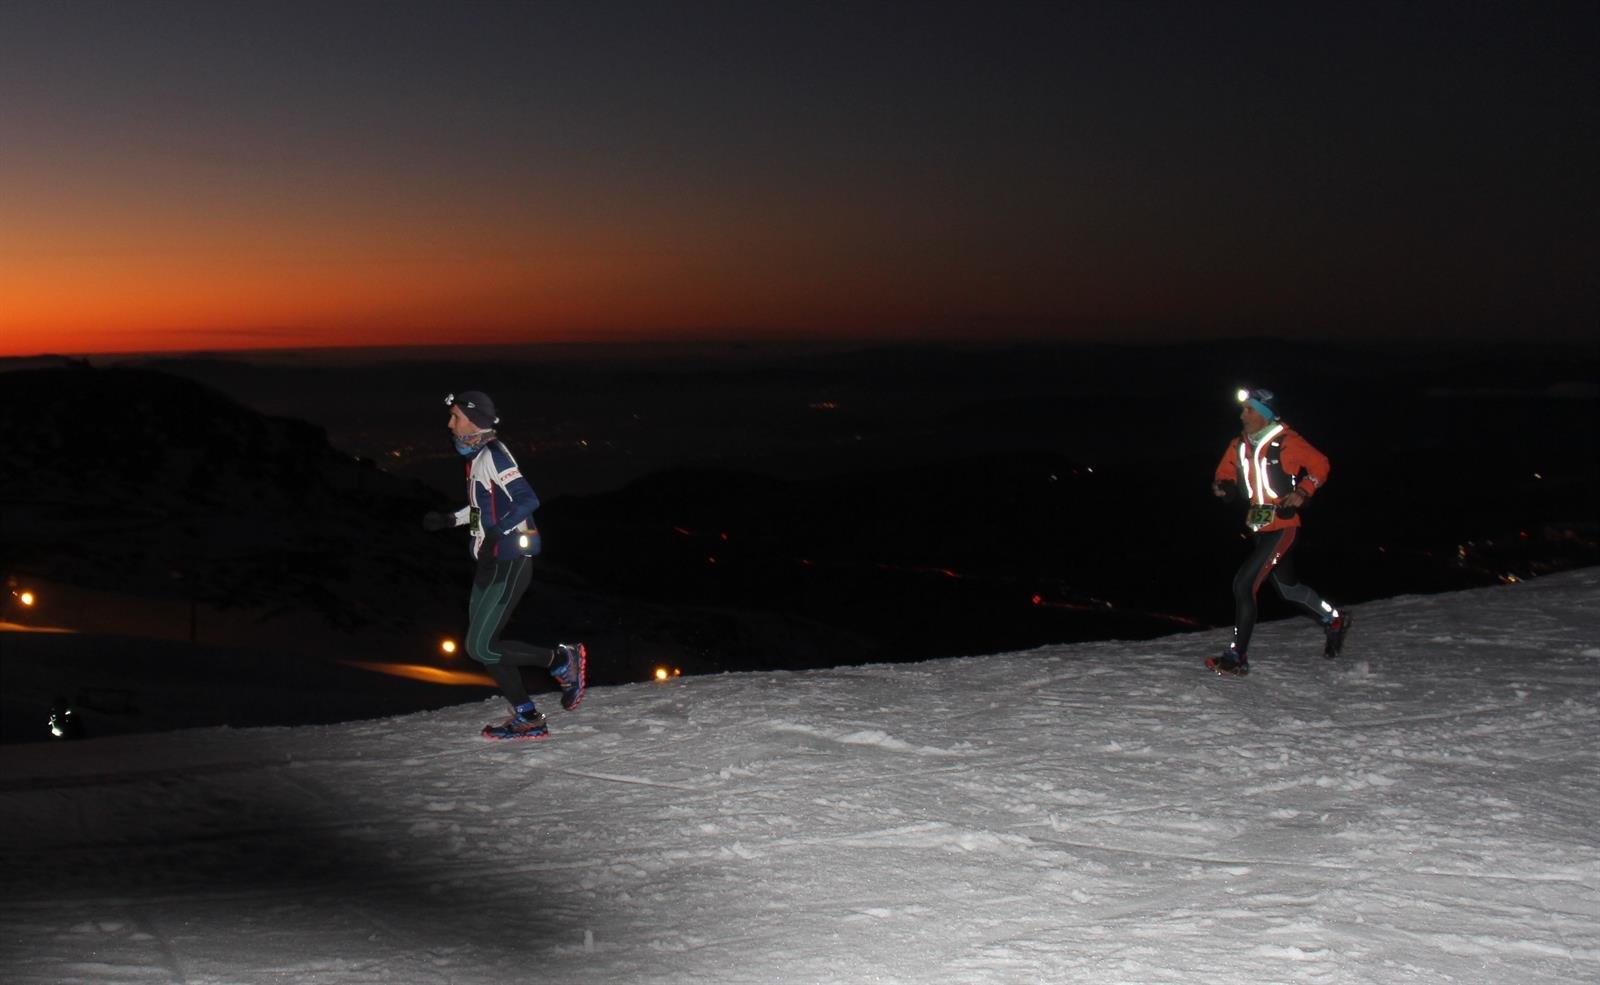 Jacob Gutiérrez y Silvia Lara ganan por tercera vez el 'Snow Running' de Sierra Nevada